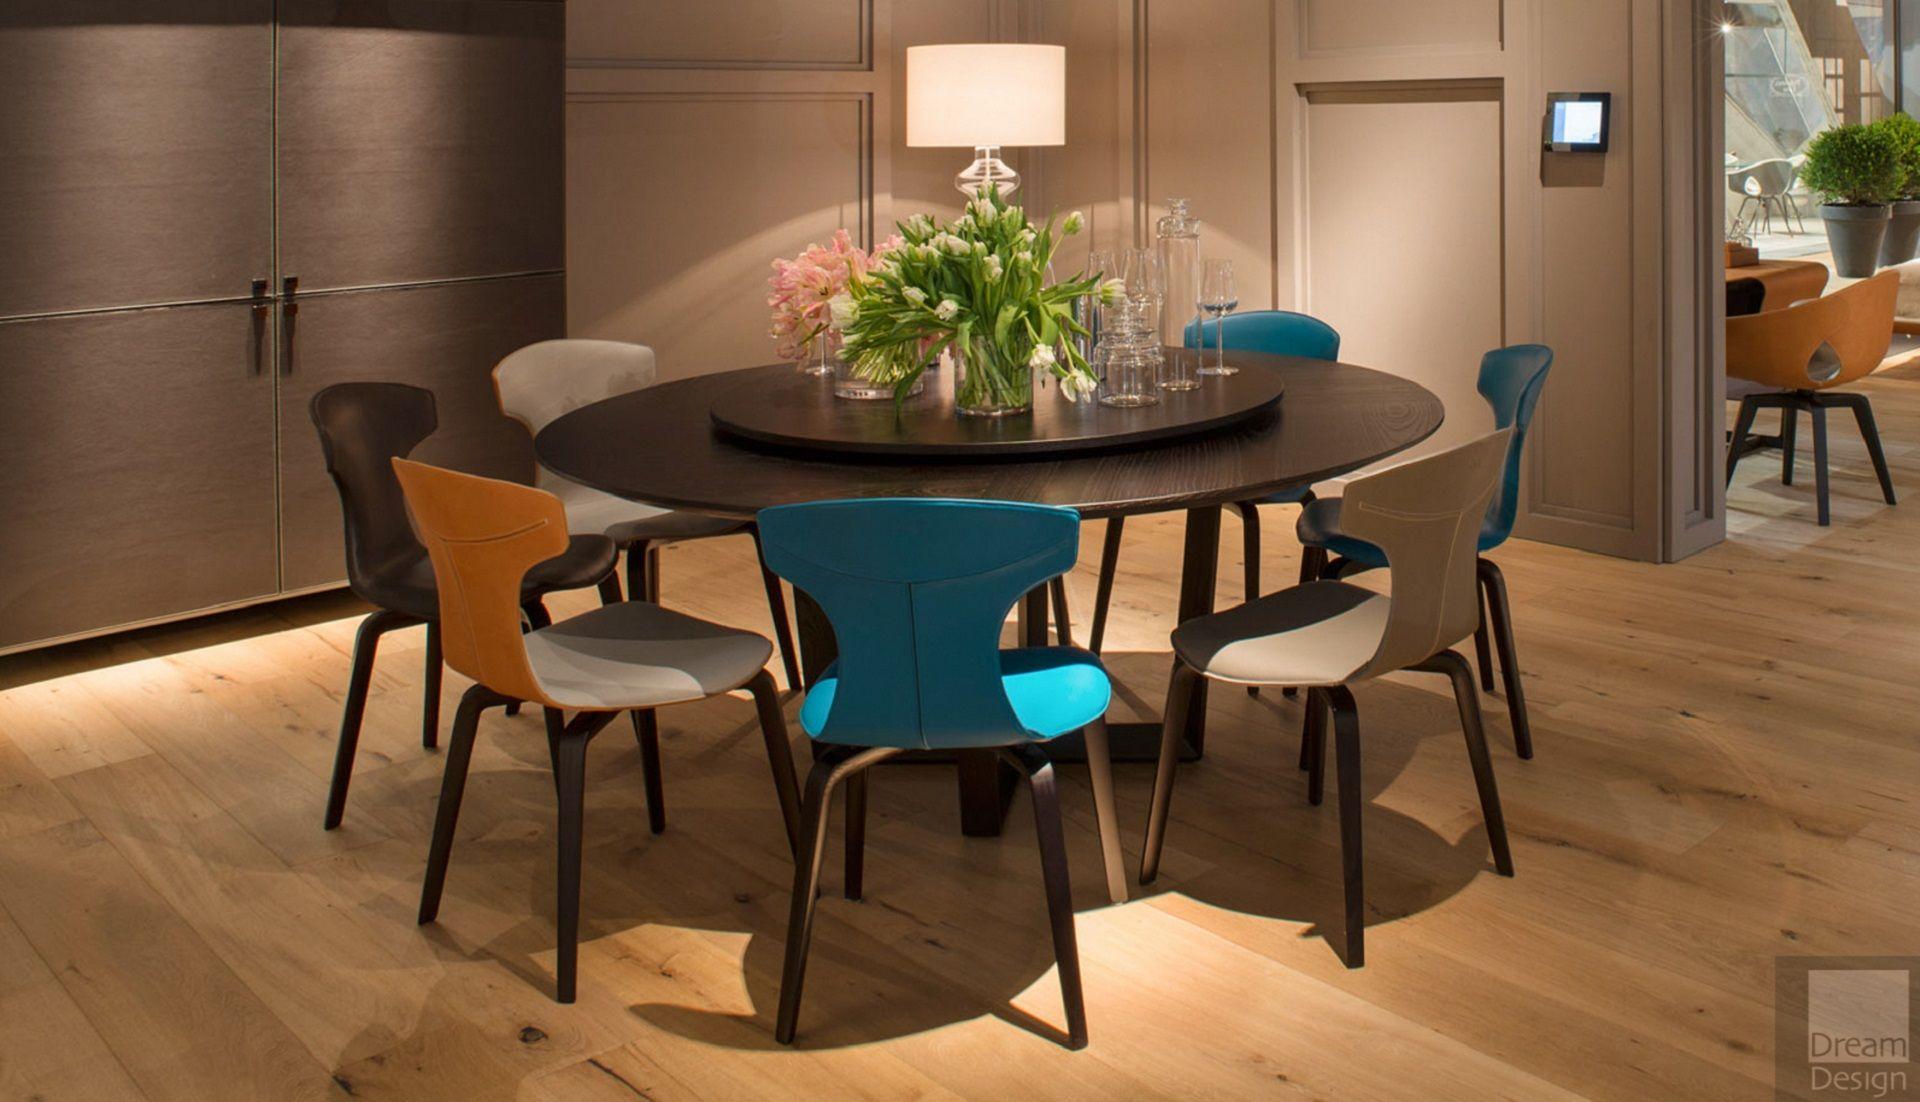 Poltrona Frau Montera Chair  Everything But Ordinary